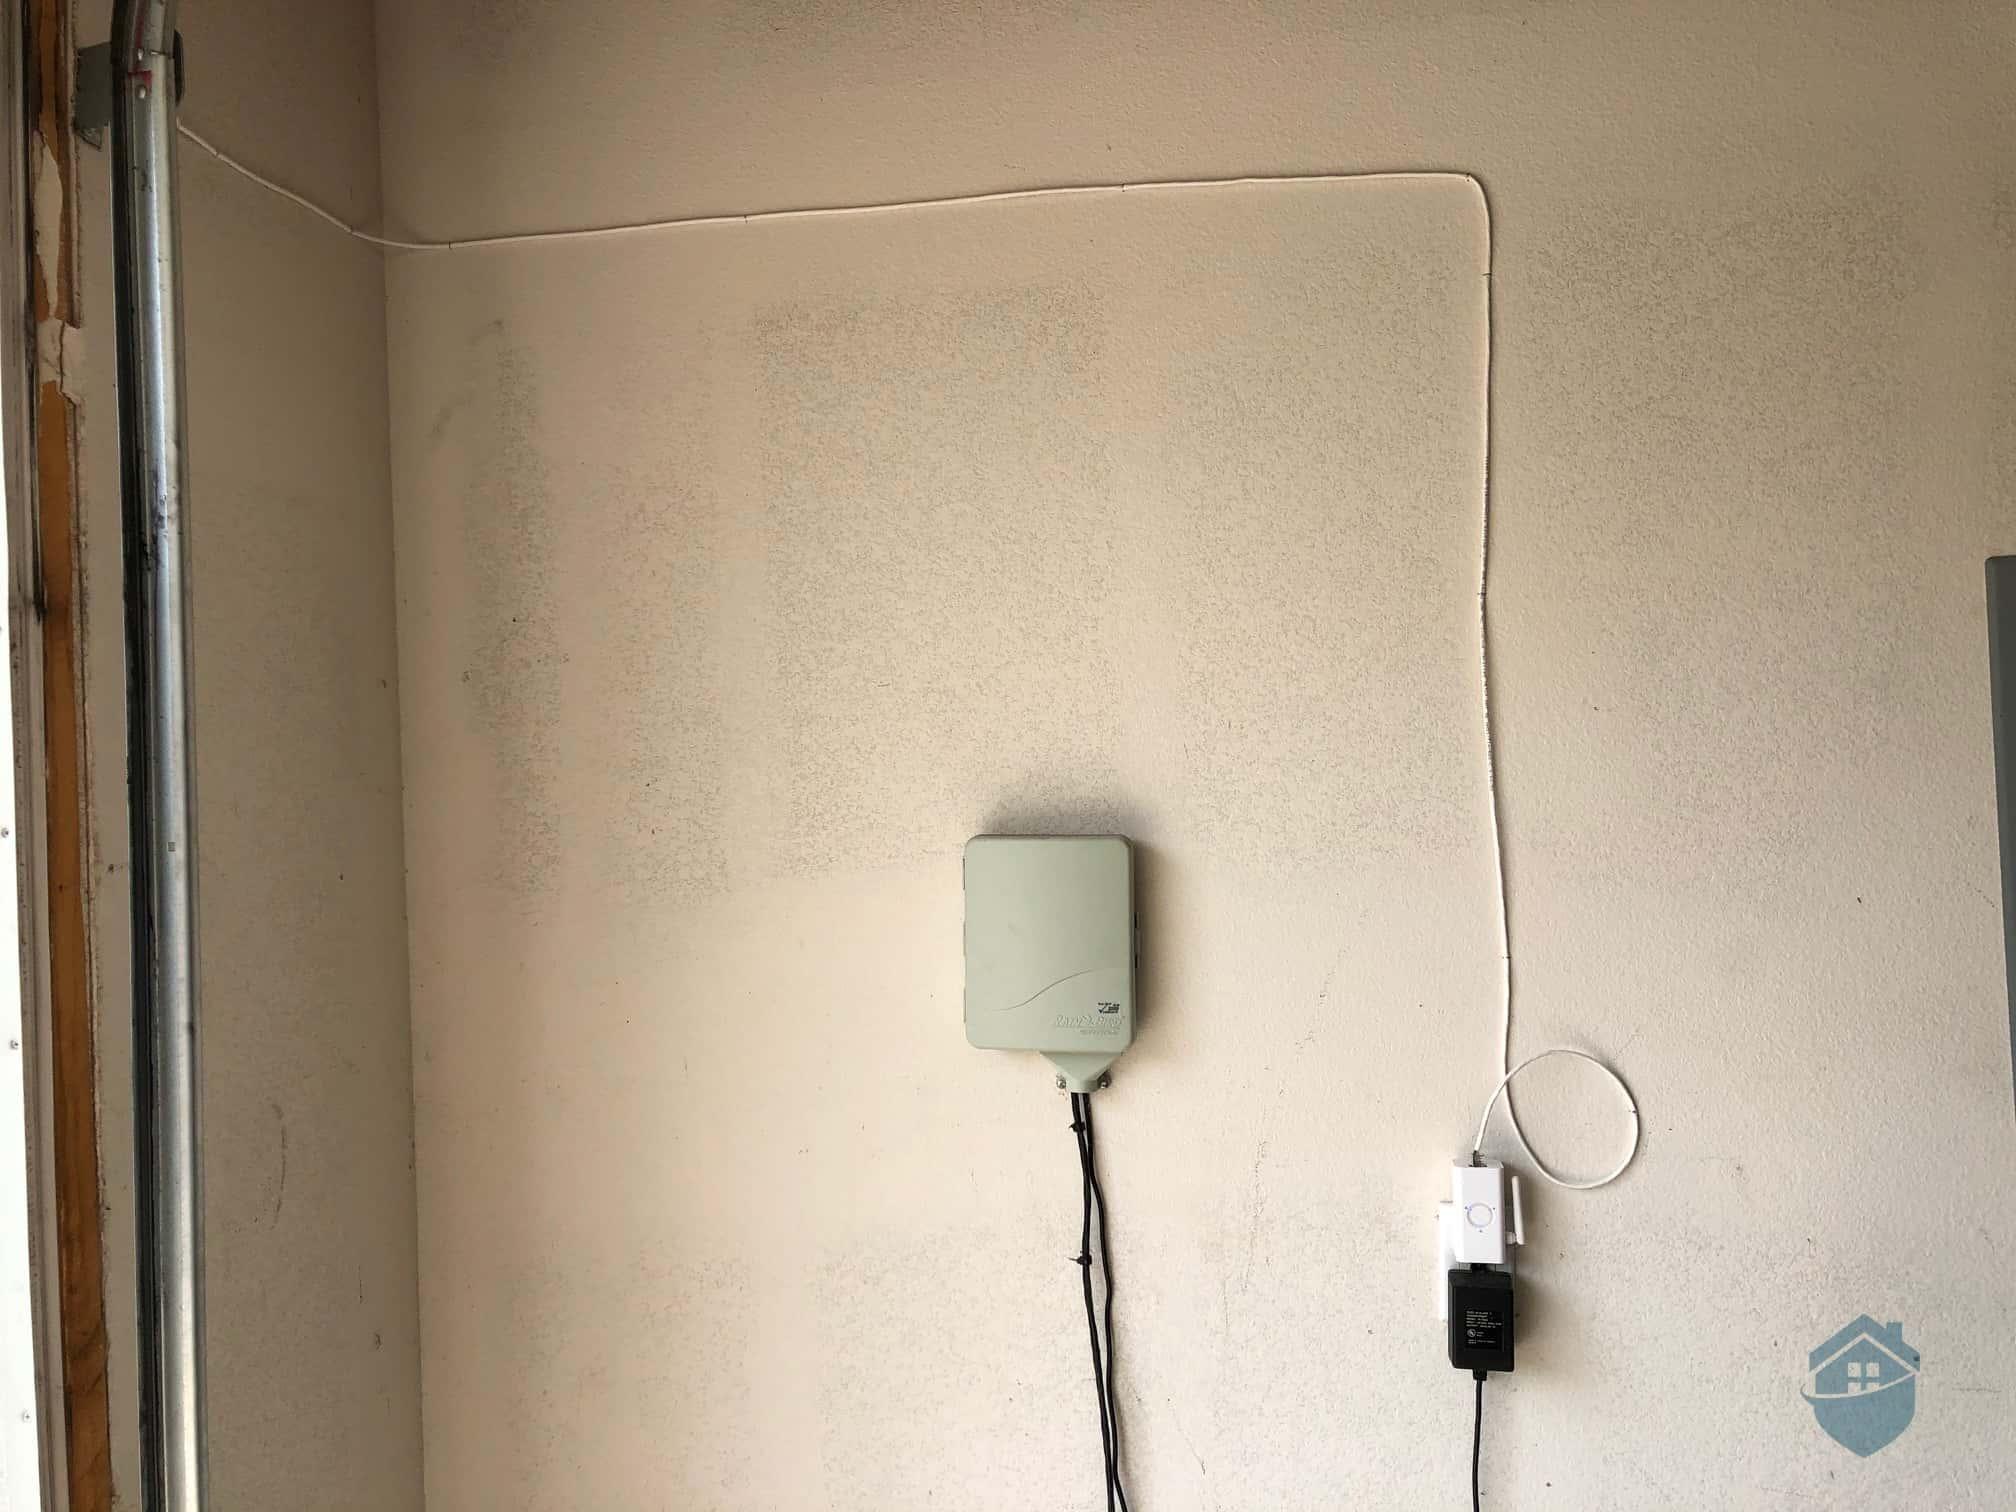 Vivint Outdoor Camera Pro Wiring